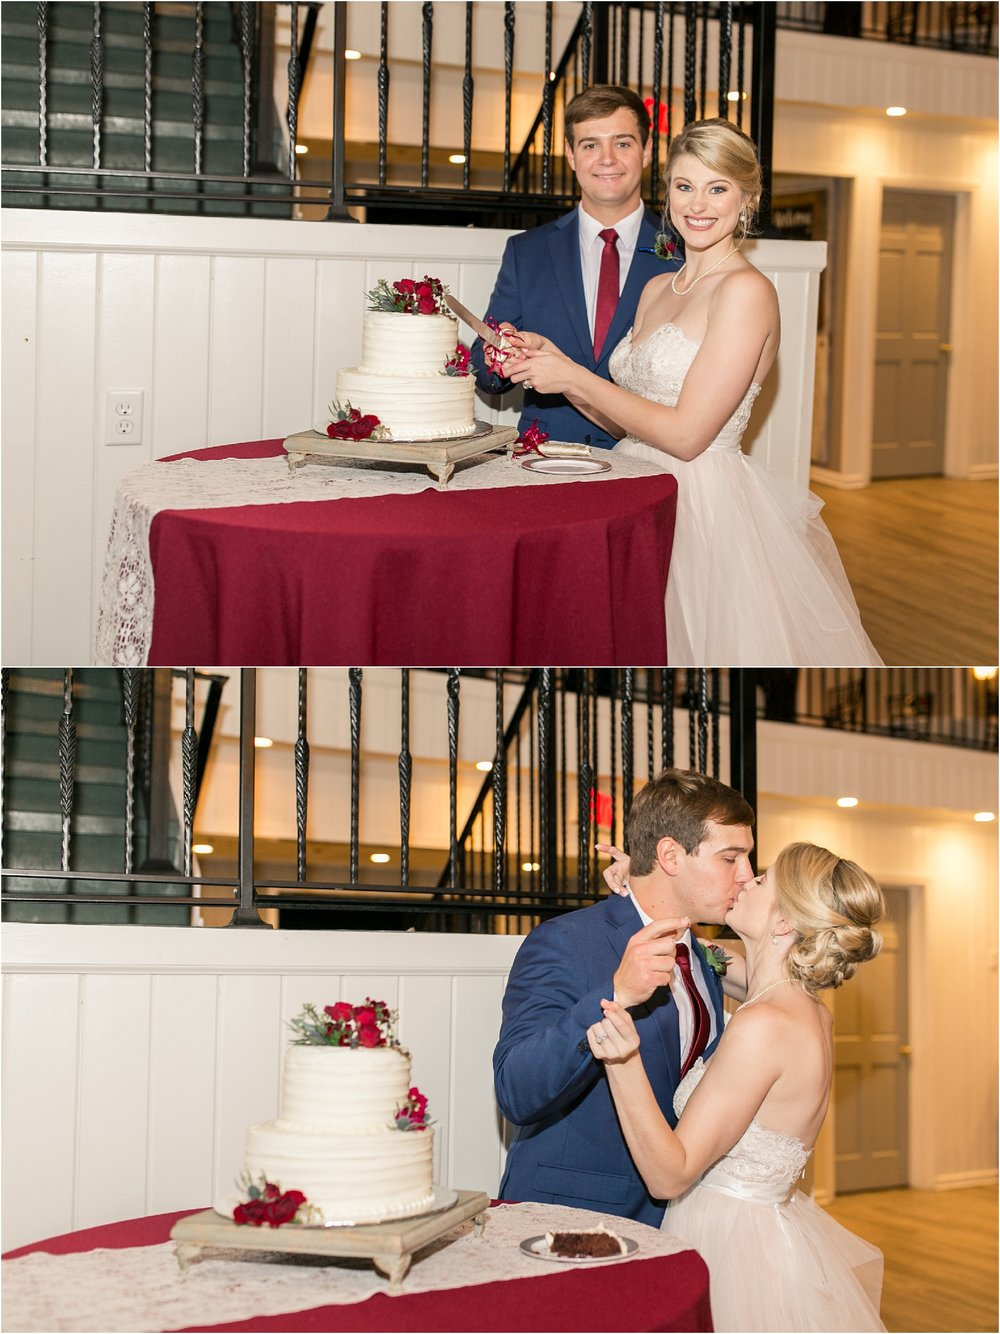 Savannah Eve Photography- Brandon-Brown Wedding-109.jpg